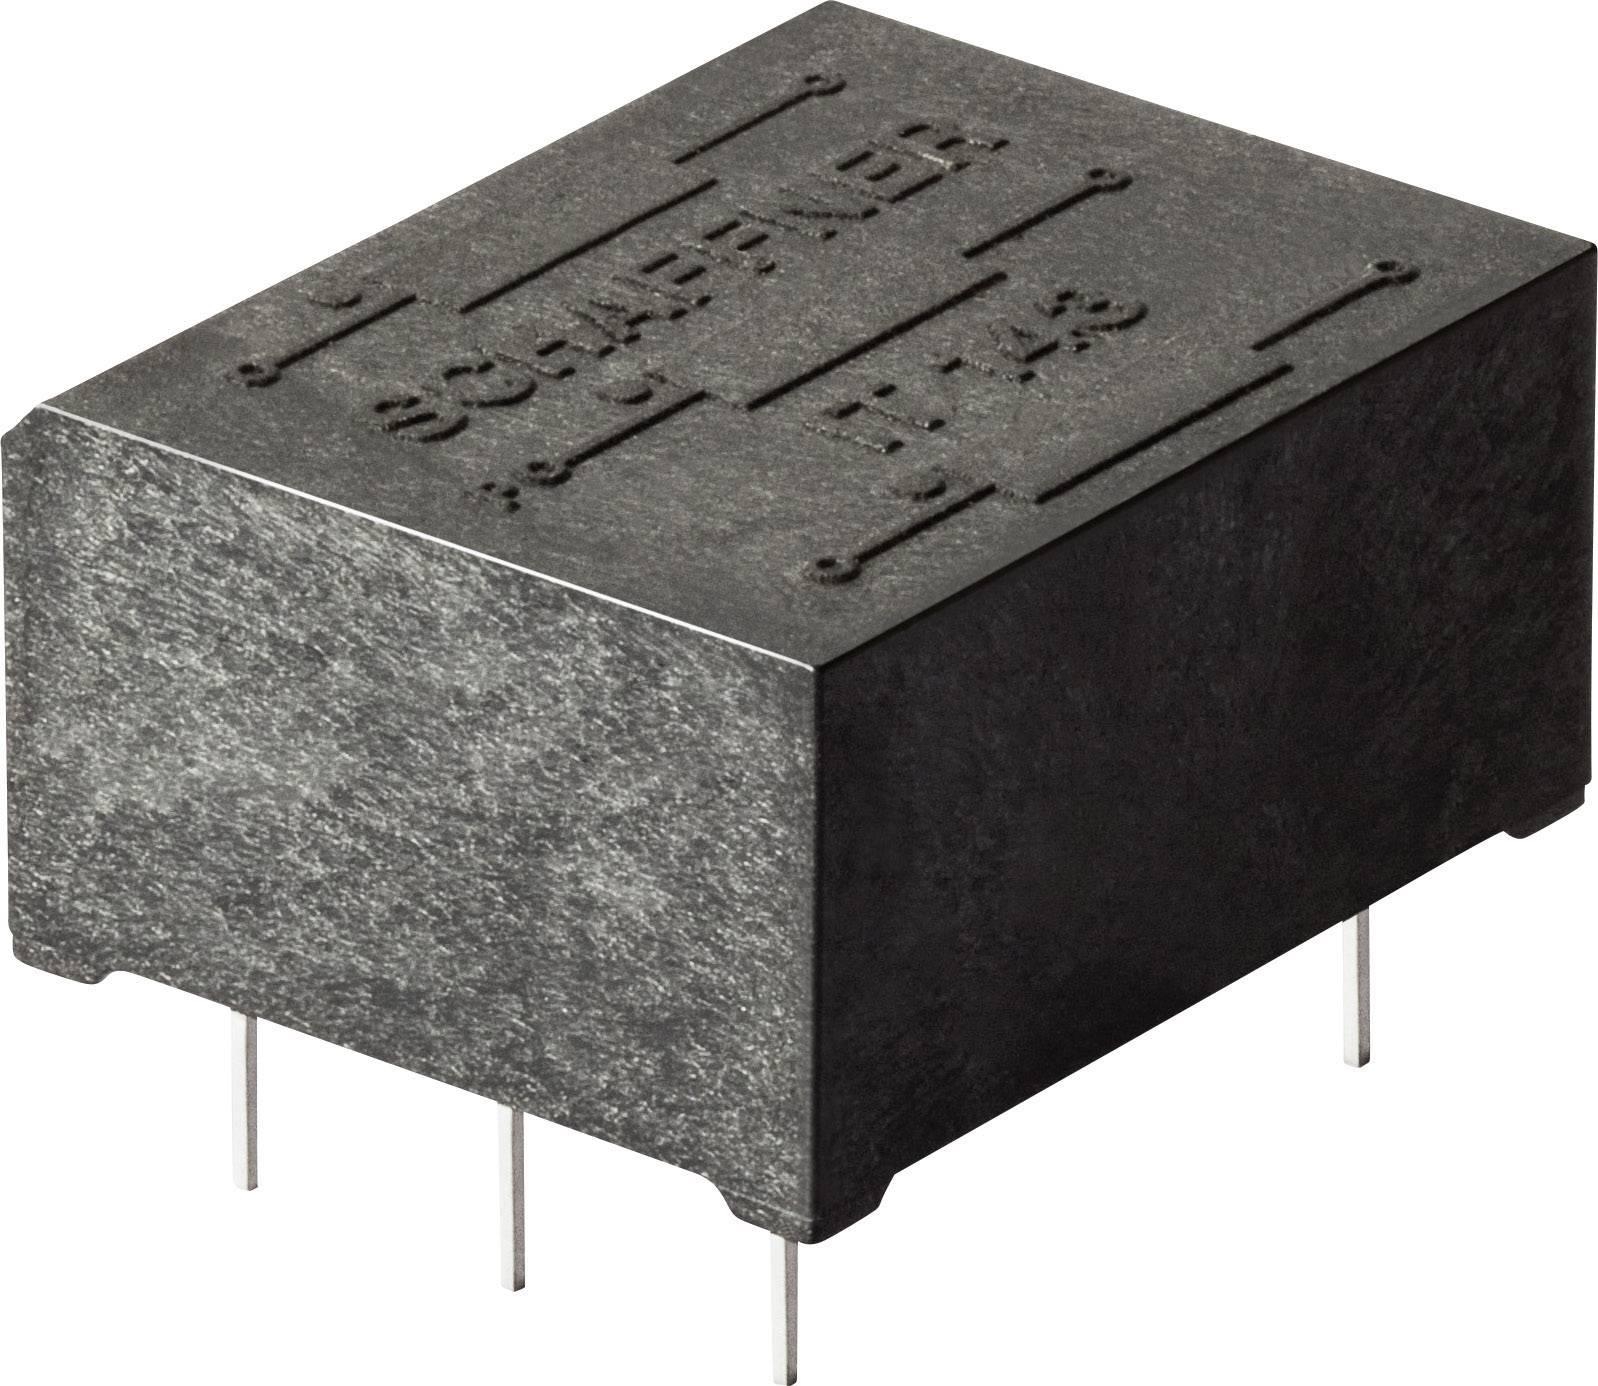 Pulzní transformátor Schaffner, IT249, 17 mH, max 500 V